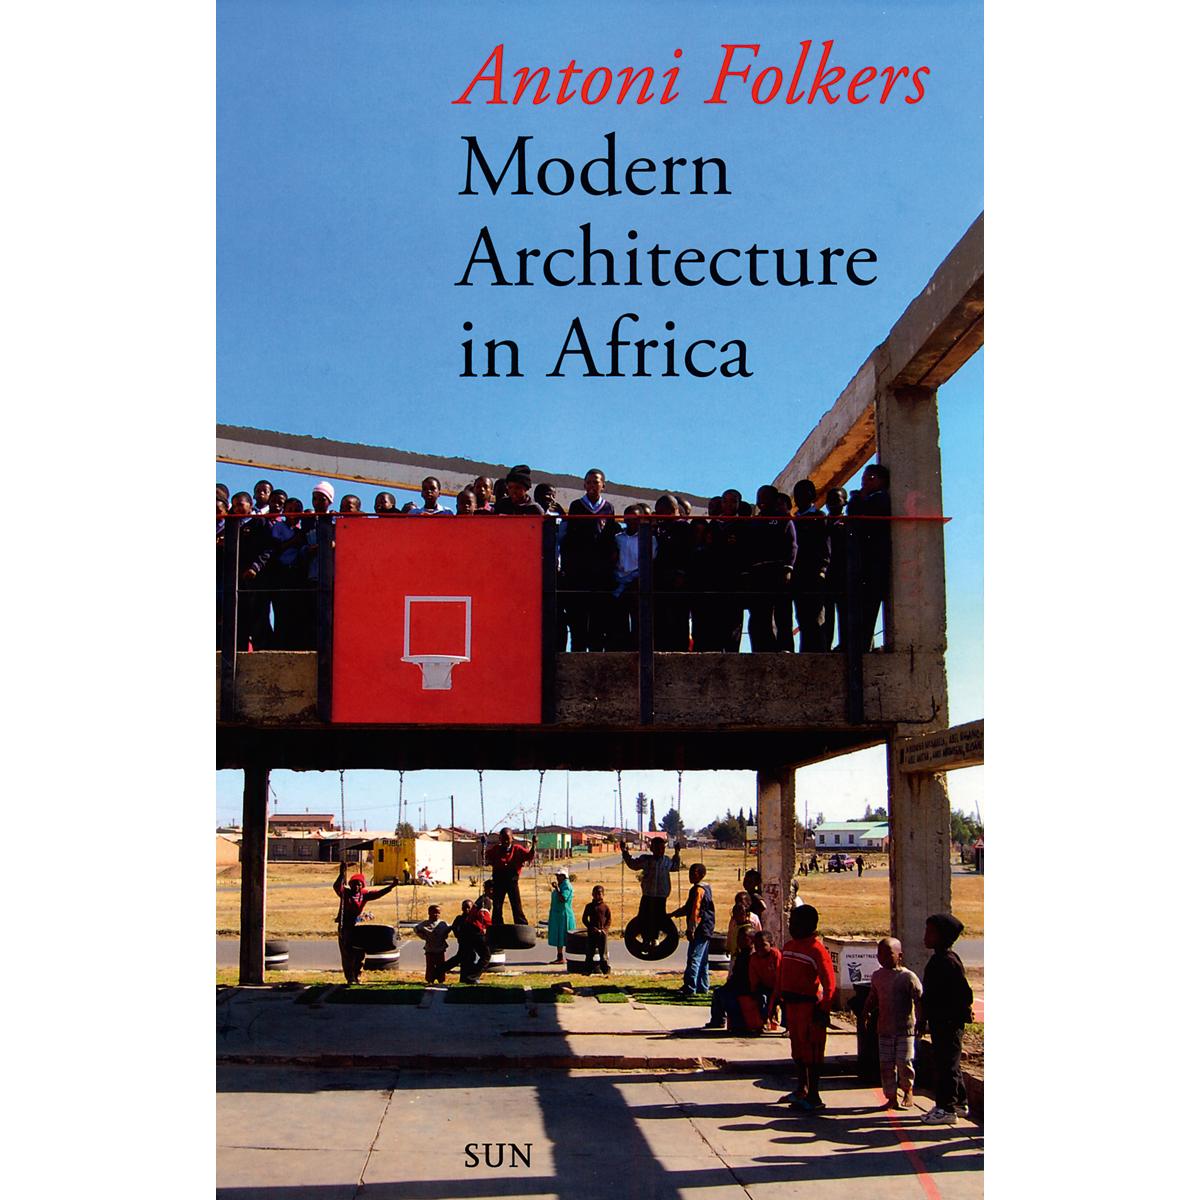 Modern Architecure in Africa